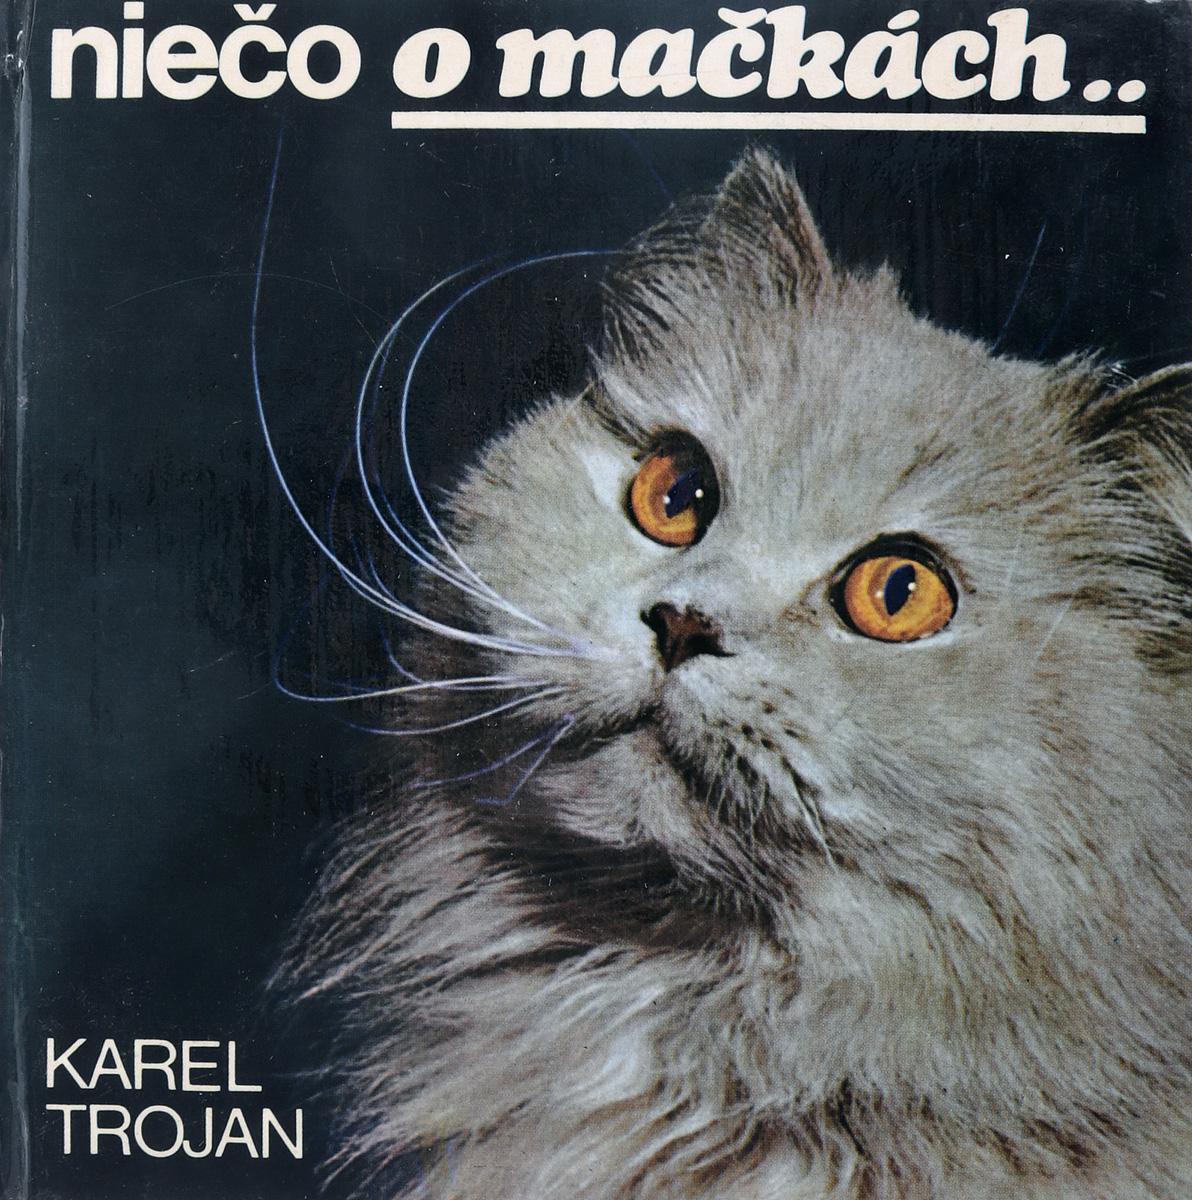 цена Karel Trojan Nieco o macrach…. в интернет-магазинах